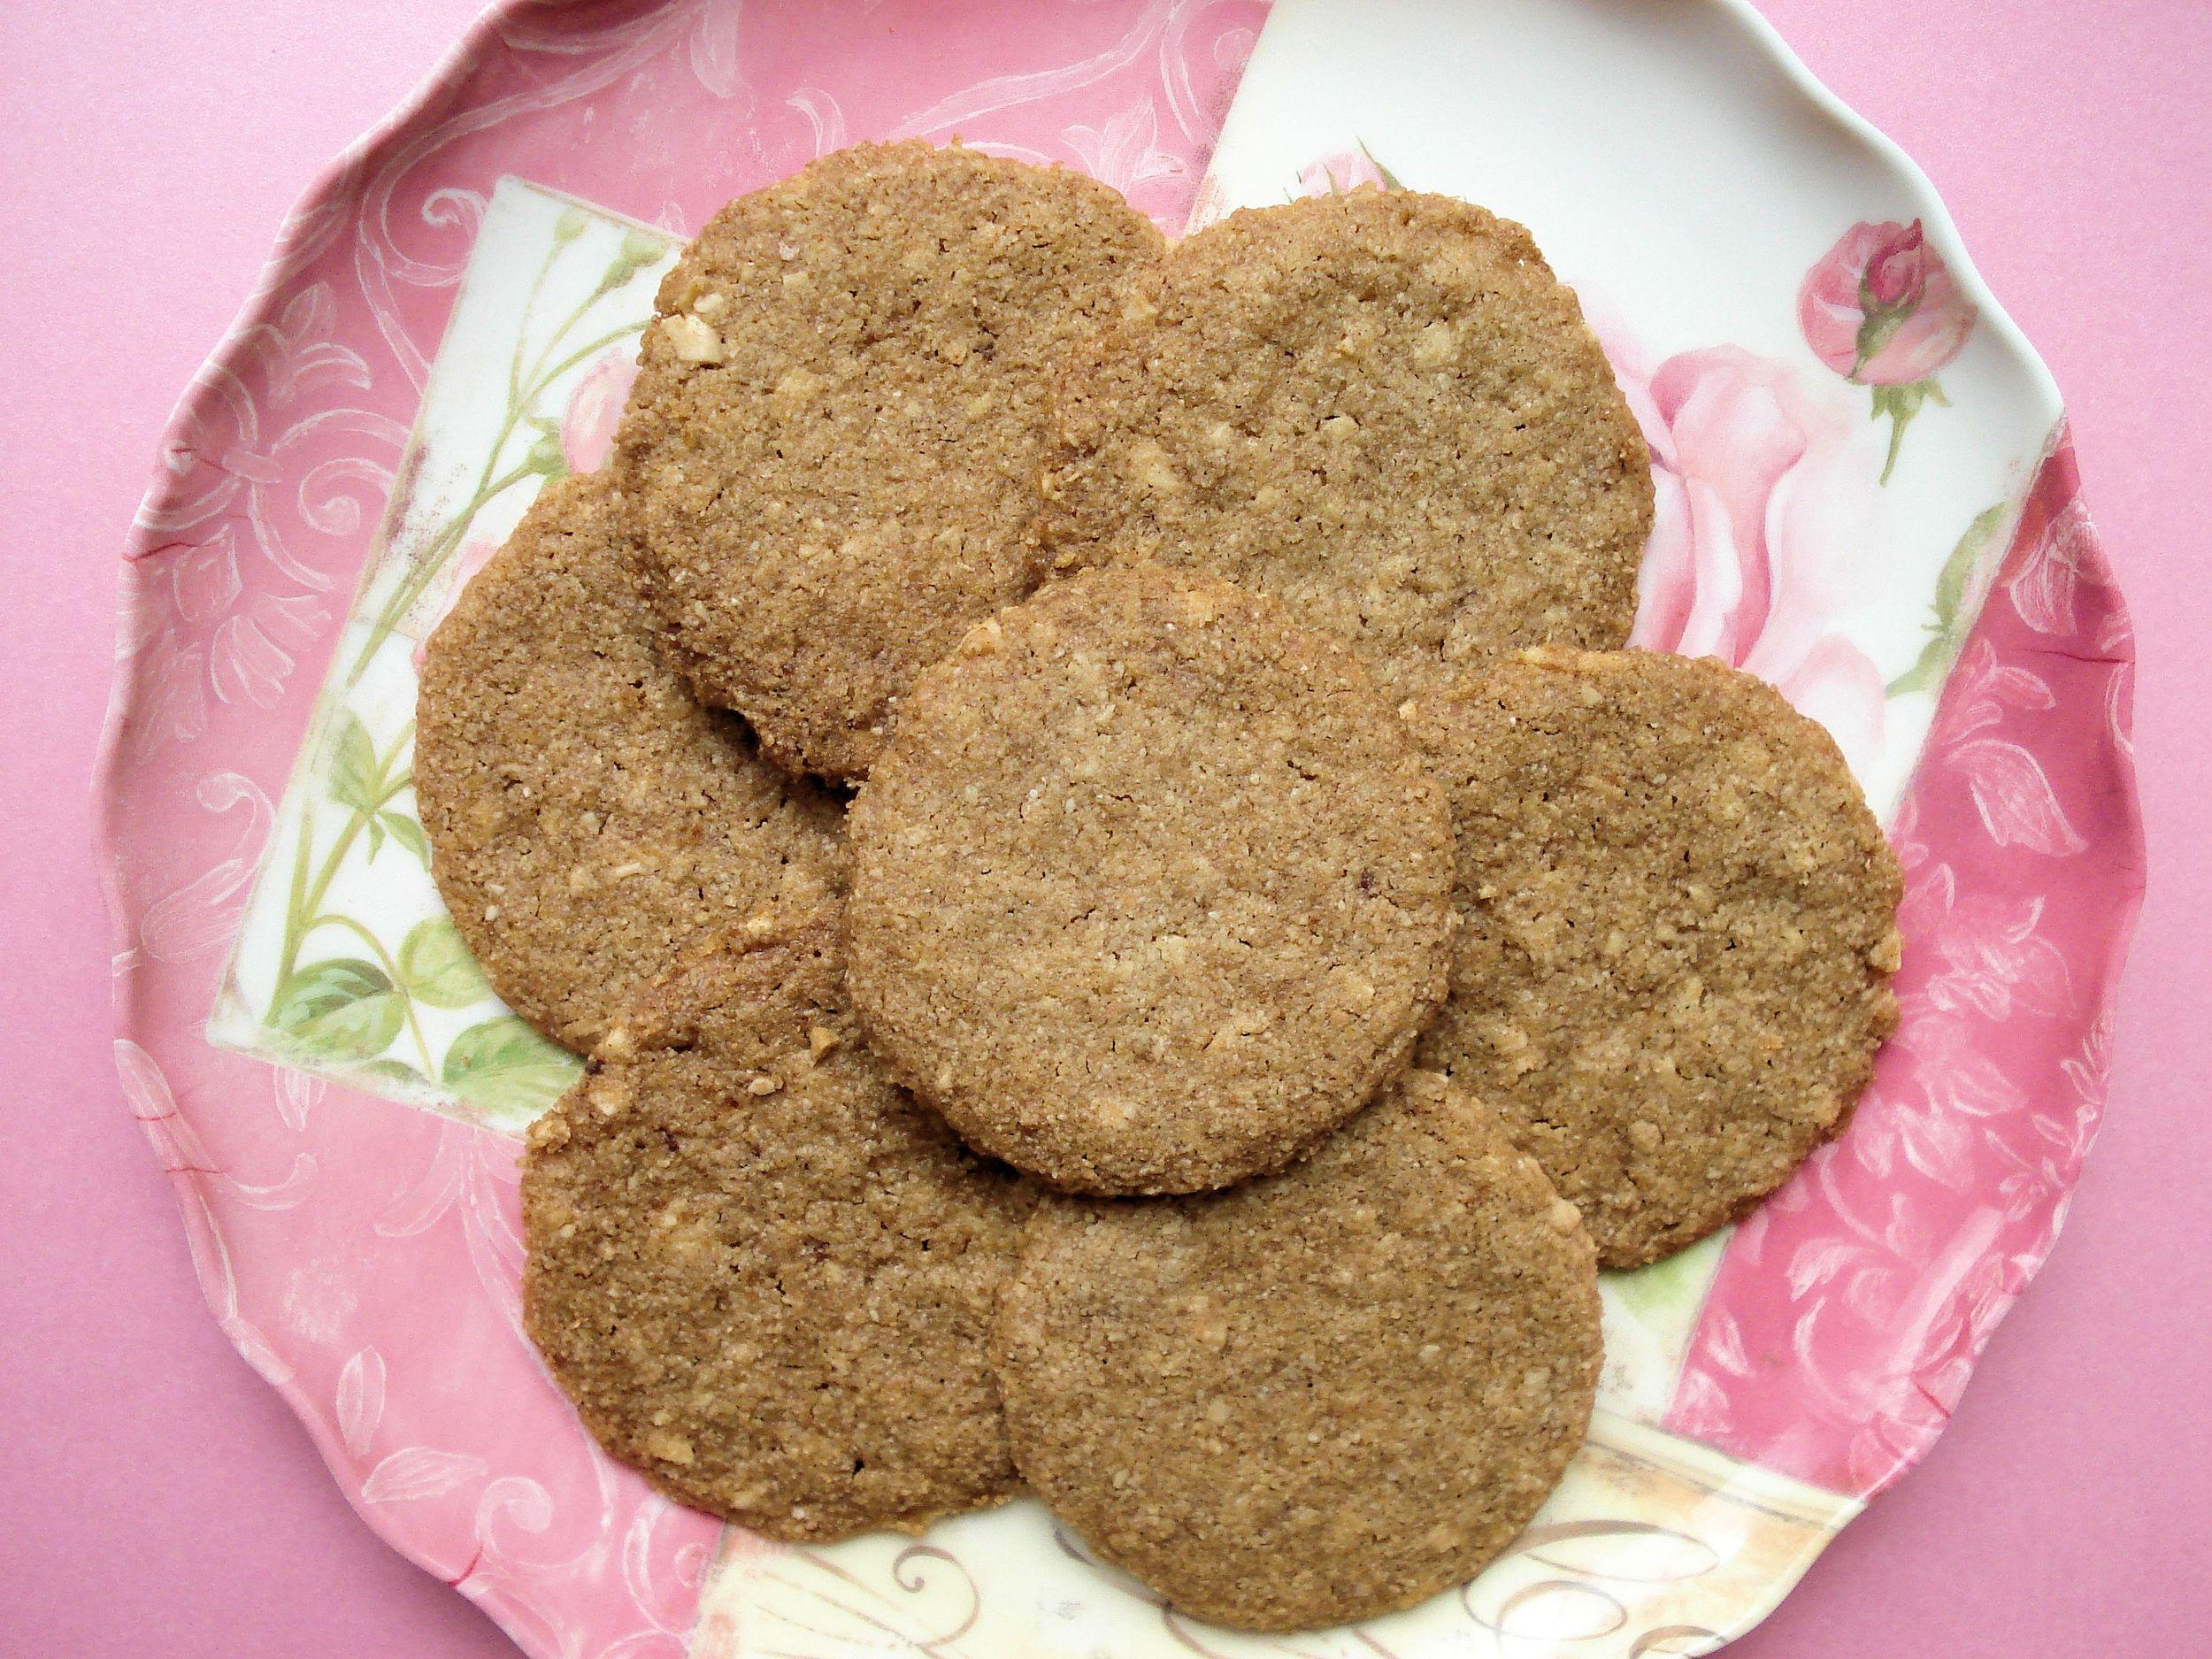 Cinnamon Almond Butter Cookies 001.jpg